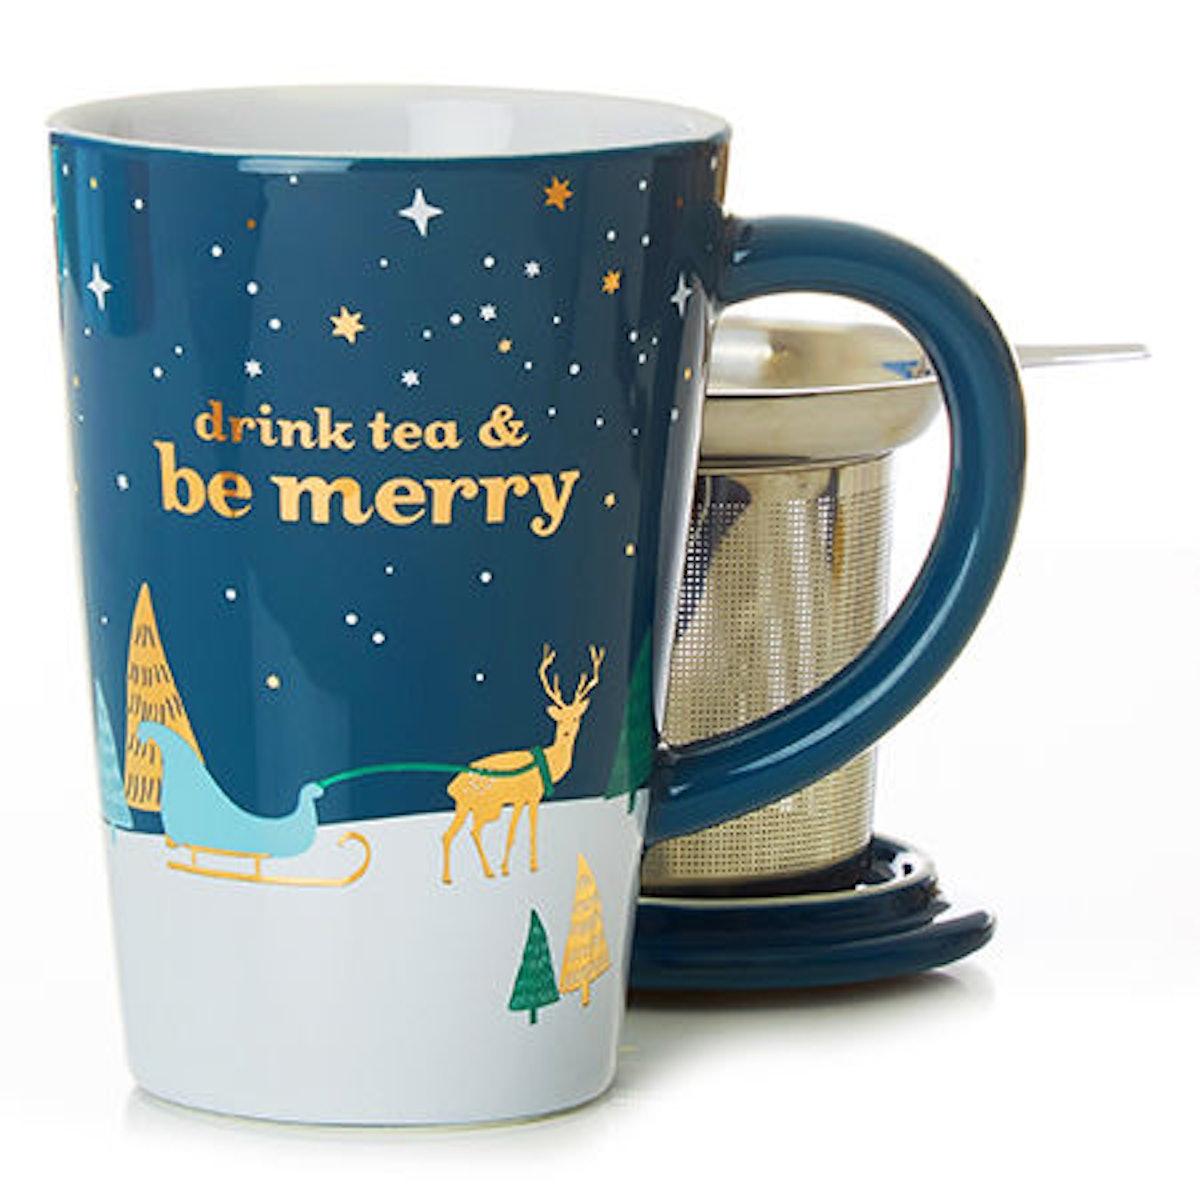 DAVIDsTEA Deep Tea Perfect Mug